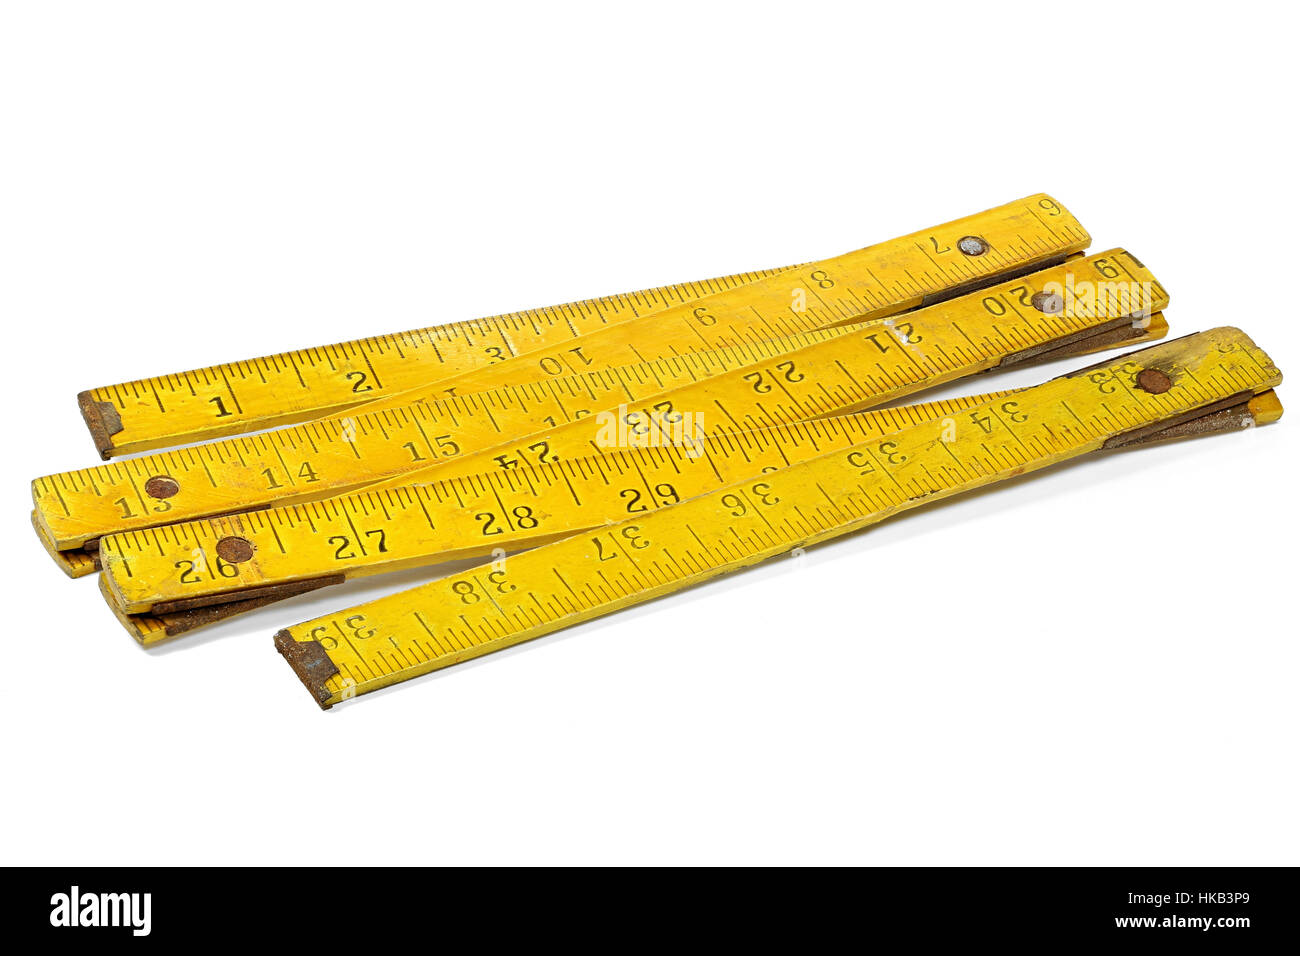 vintage 1 meter yardstick (inch unit) isolated on white background - Stock Image